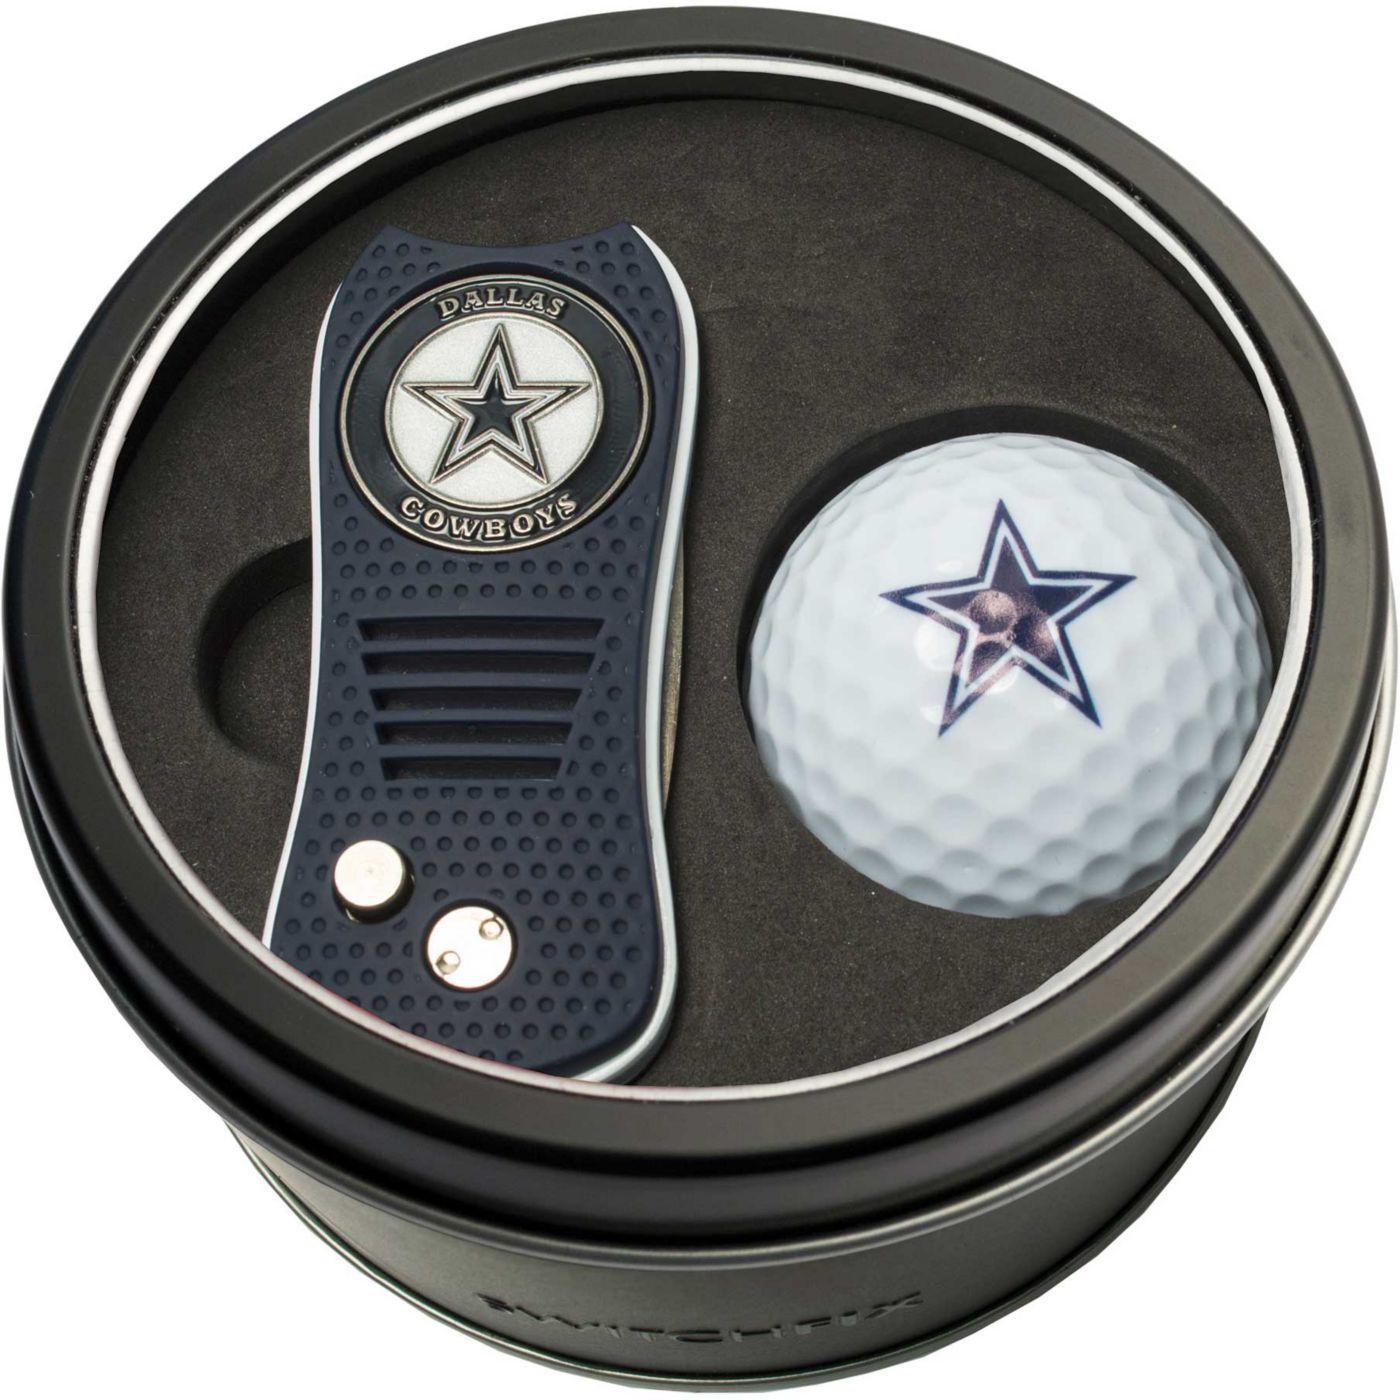 Team Golf Dallas Cowboys Switchfix Divot Tool and Golf Ball Set